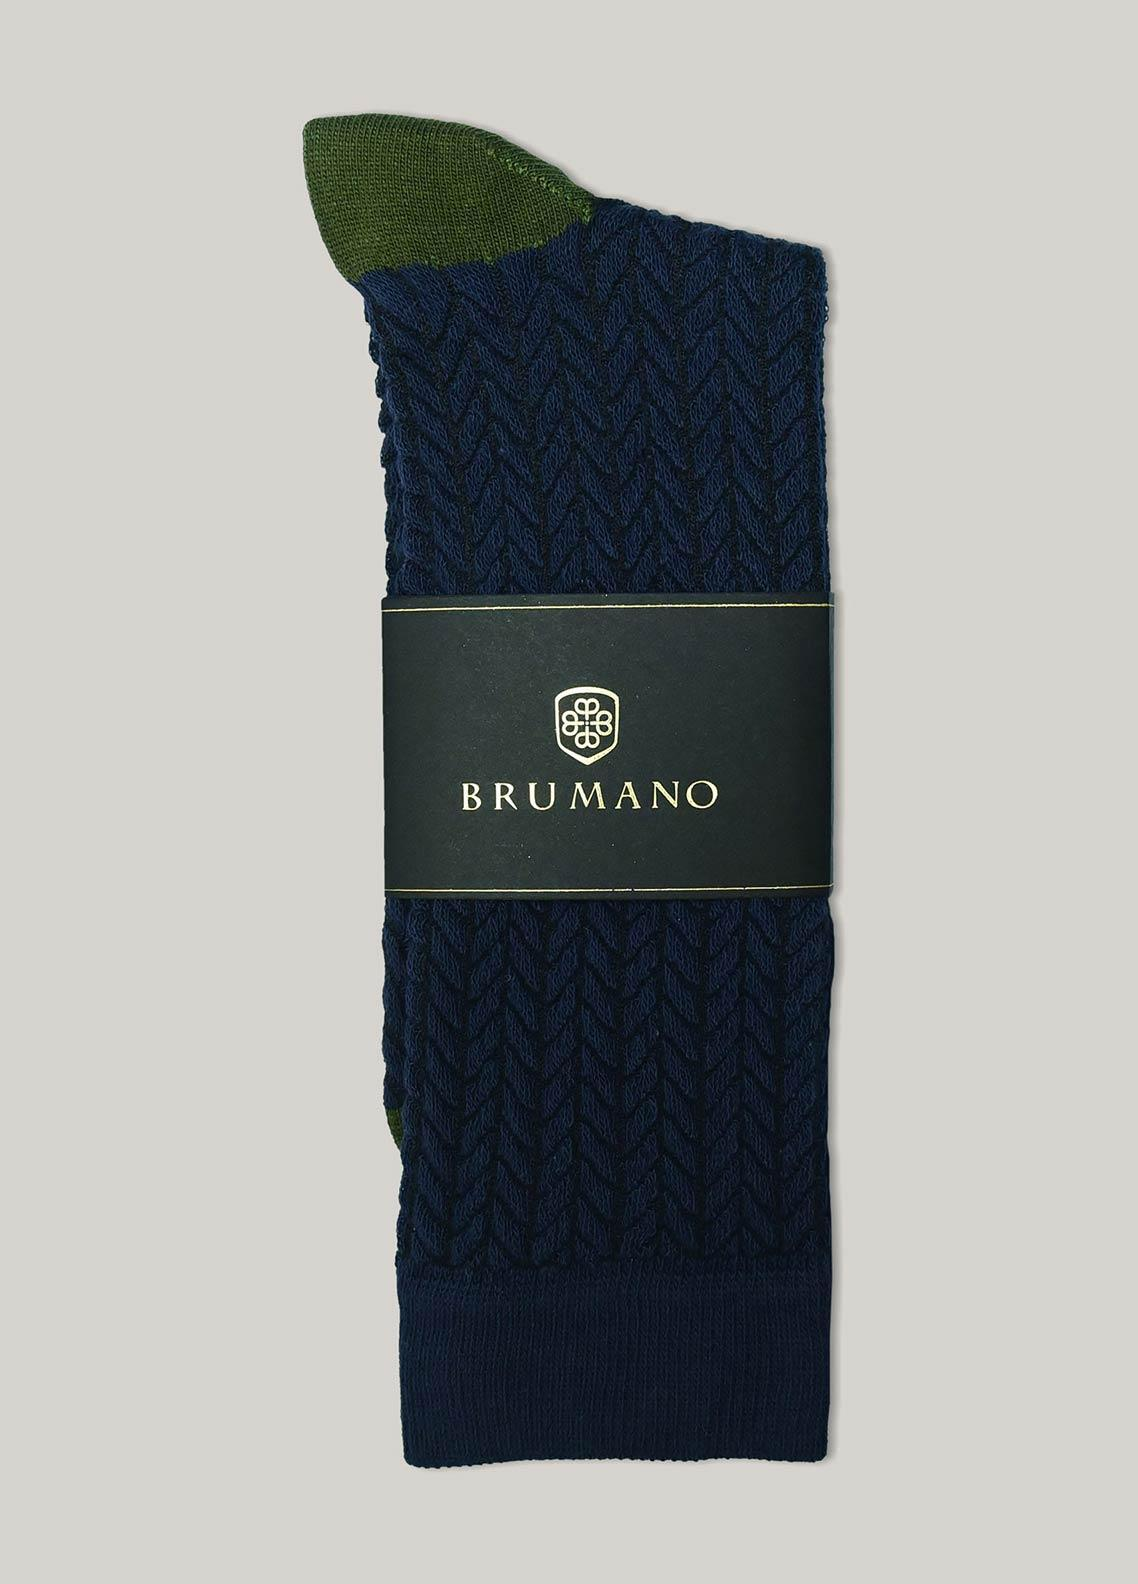 Brumano Cotton Socks BM20CSK Navy Blue Herringbone Cotton Socks